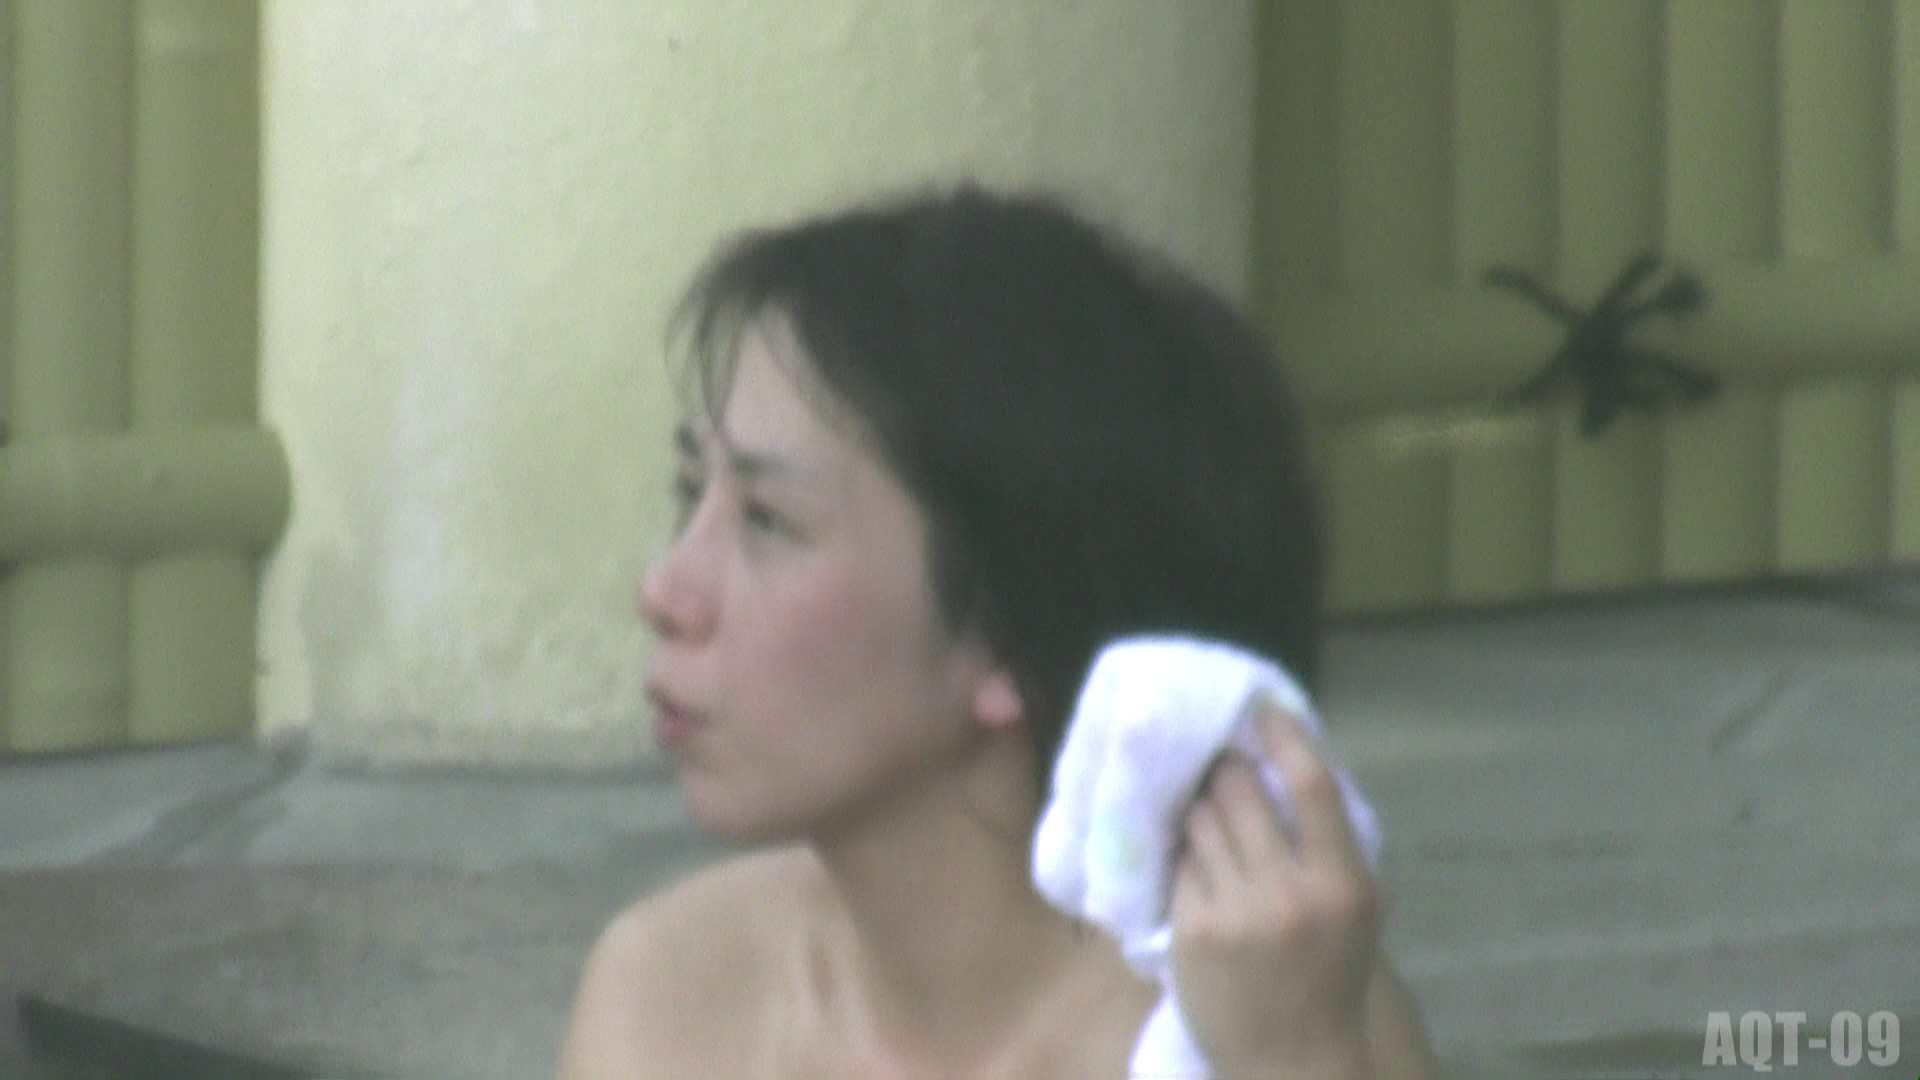 Aquaな露天風呂Vol.788 OL女体 セックス無修正動画無料 44連発 35